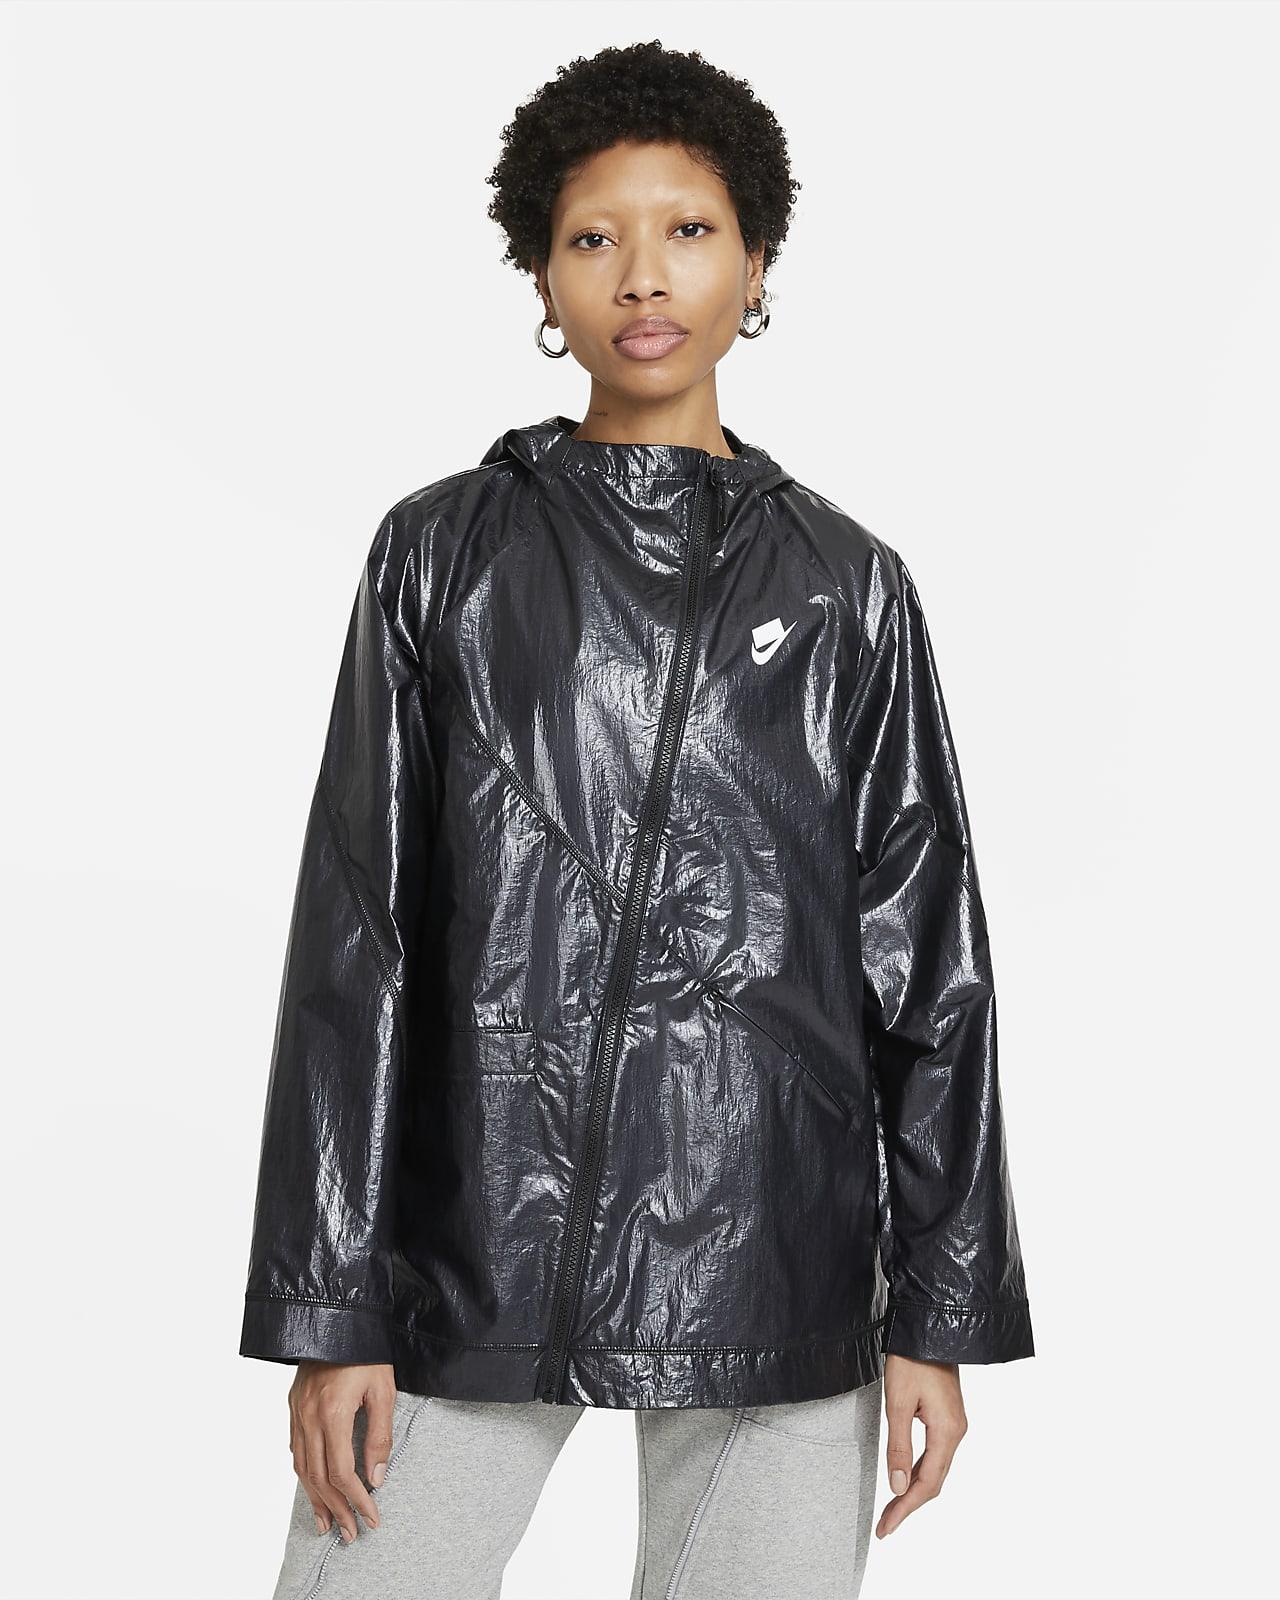 Chamarra de tejido Woven para mujer Nike Sportswear NSW